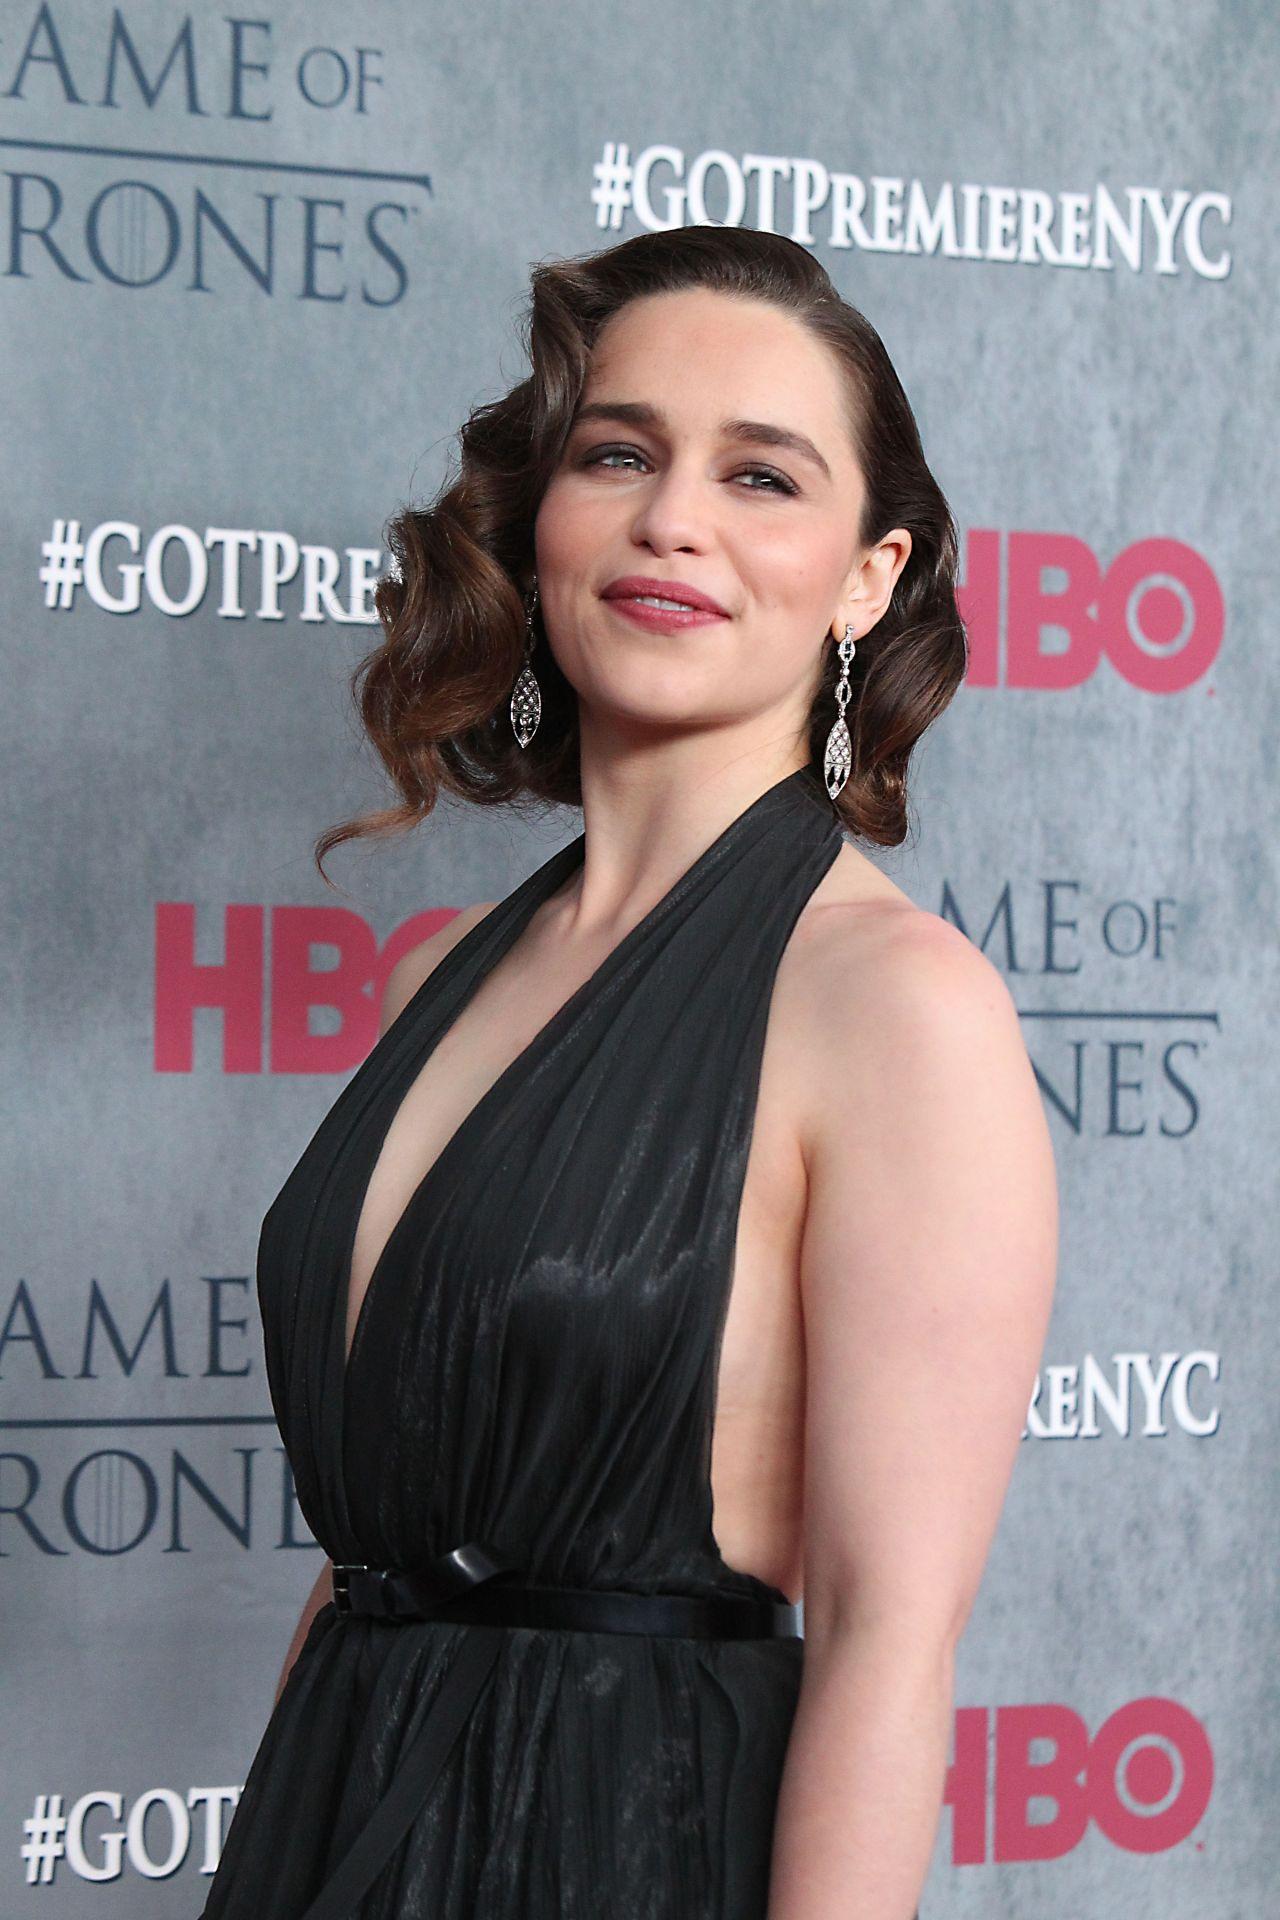 emilia clarke at game of thrones season 4 premiere in